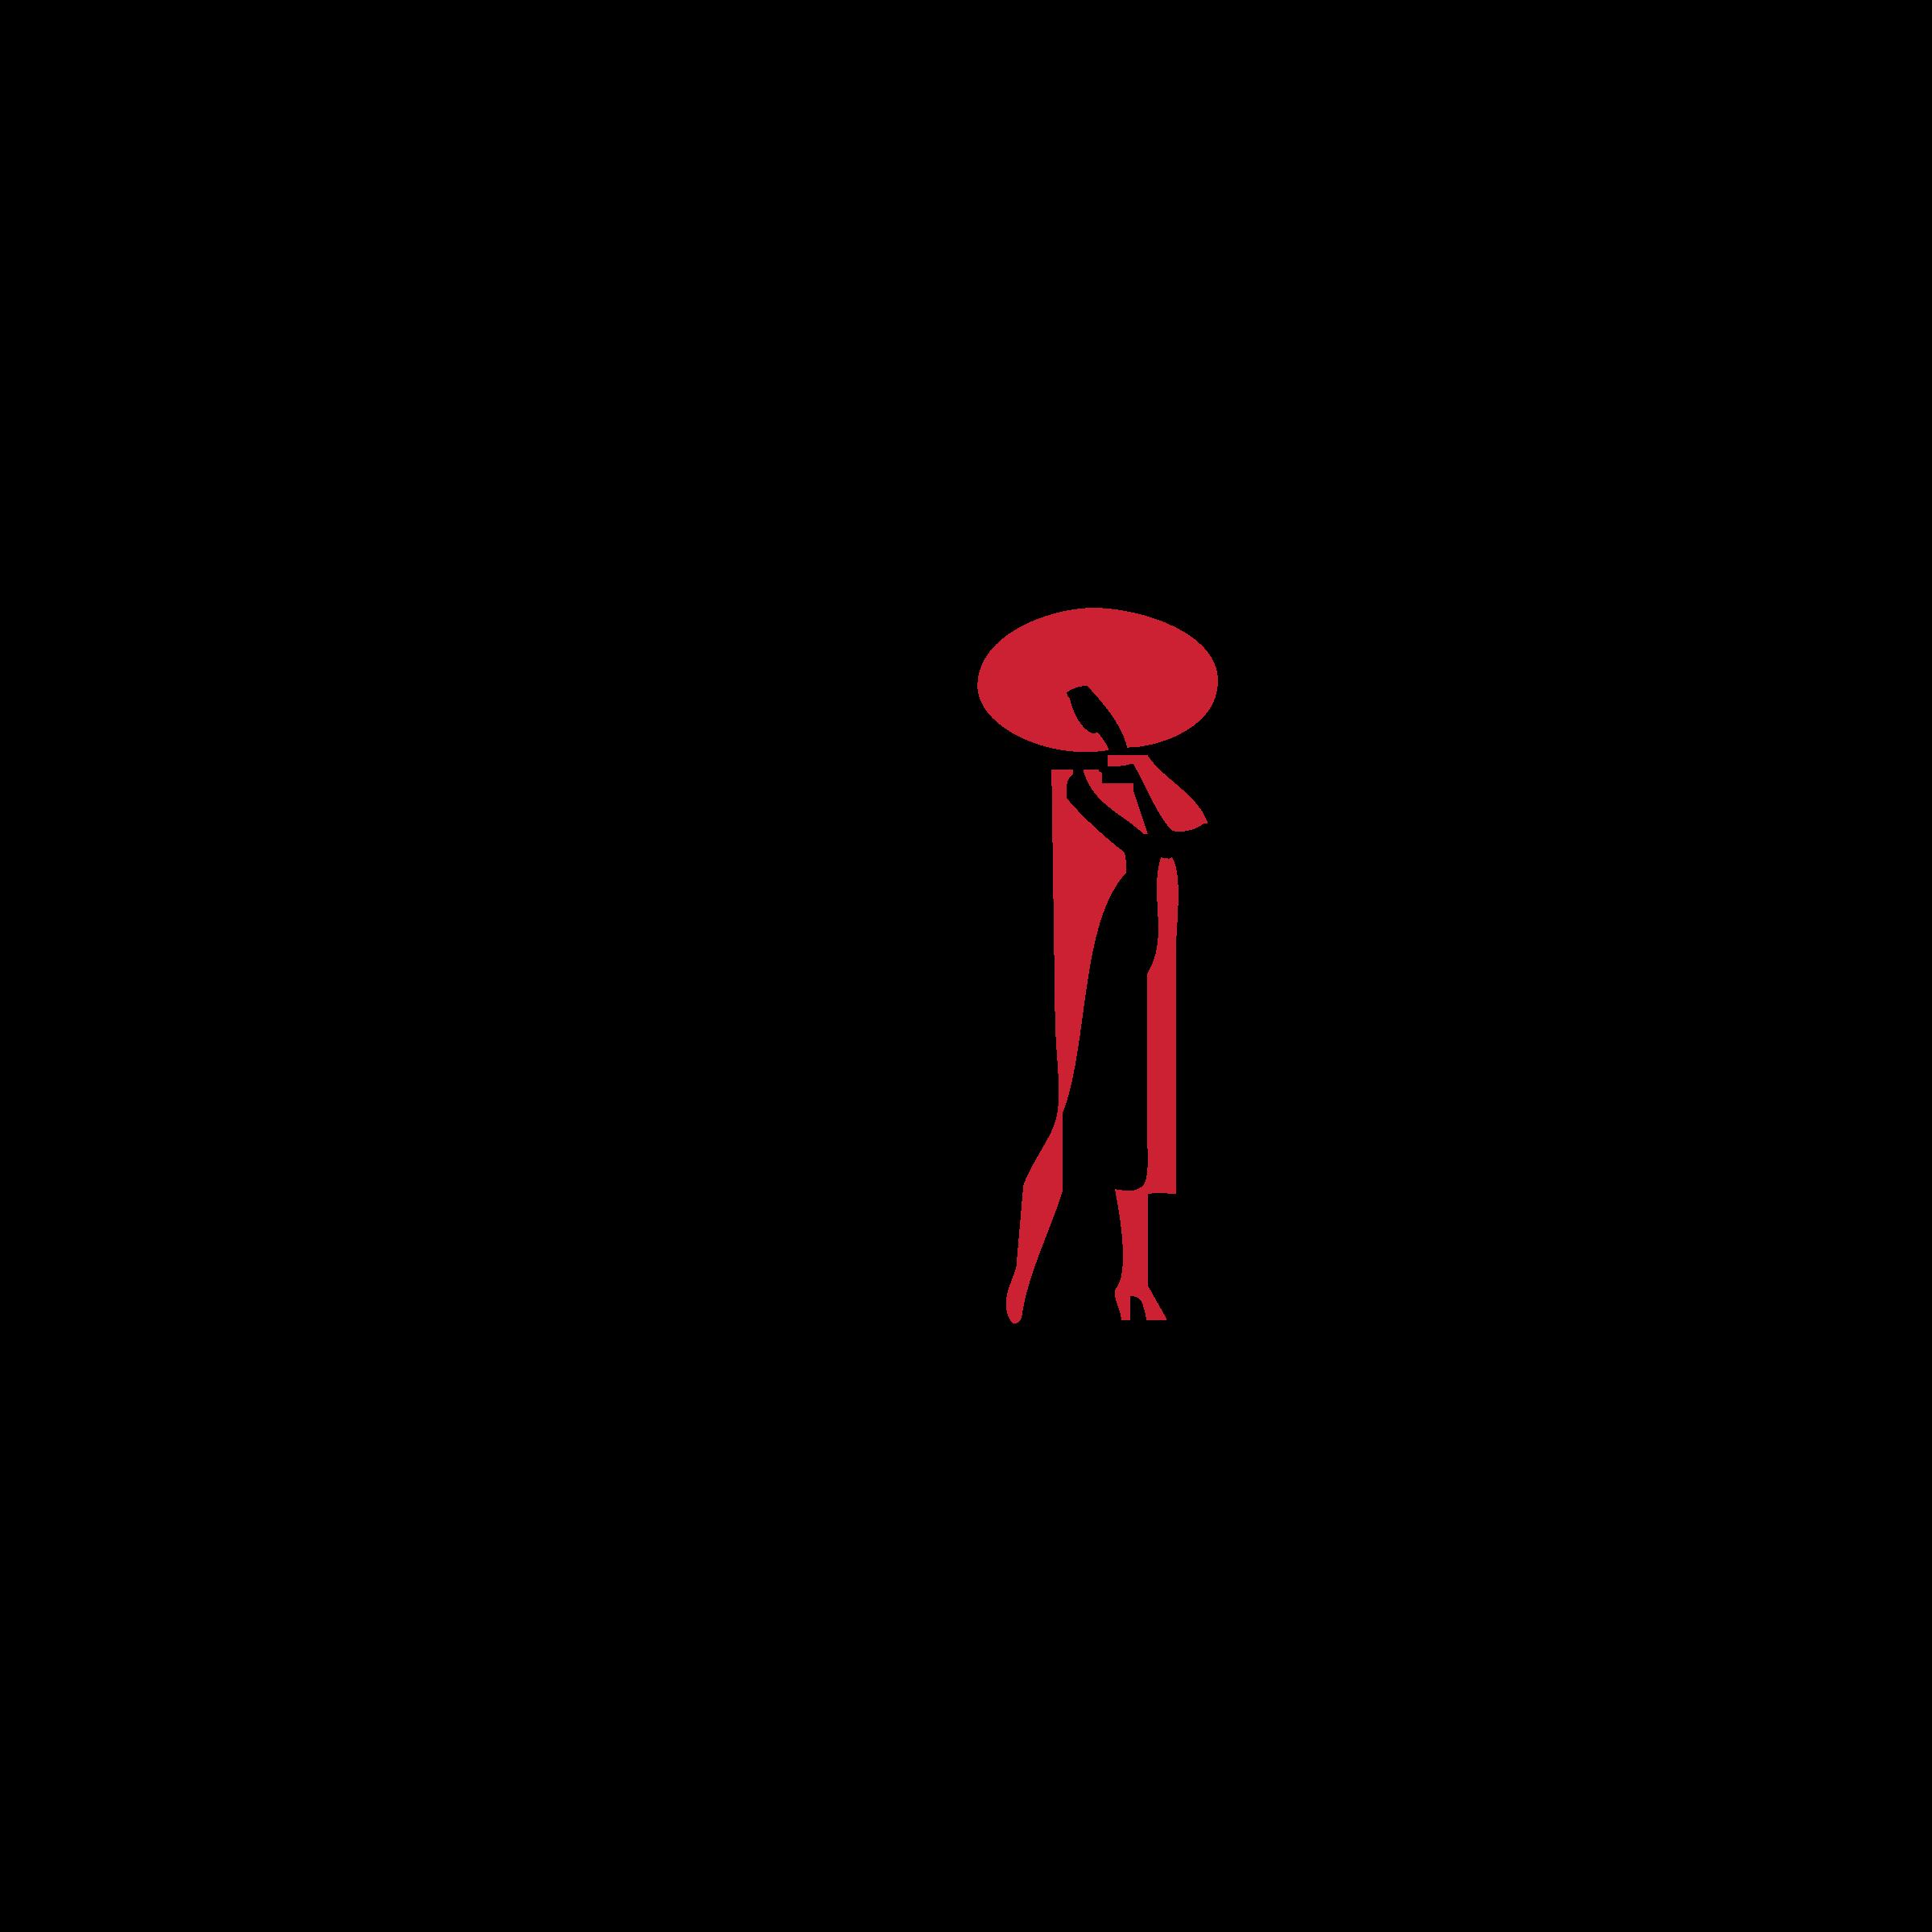 Karina Logo PNG Transparent & SVG Vector.